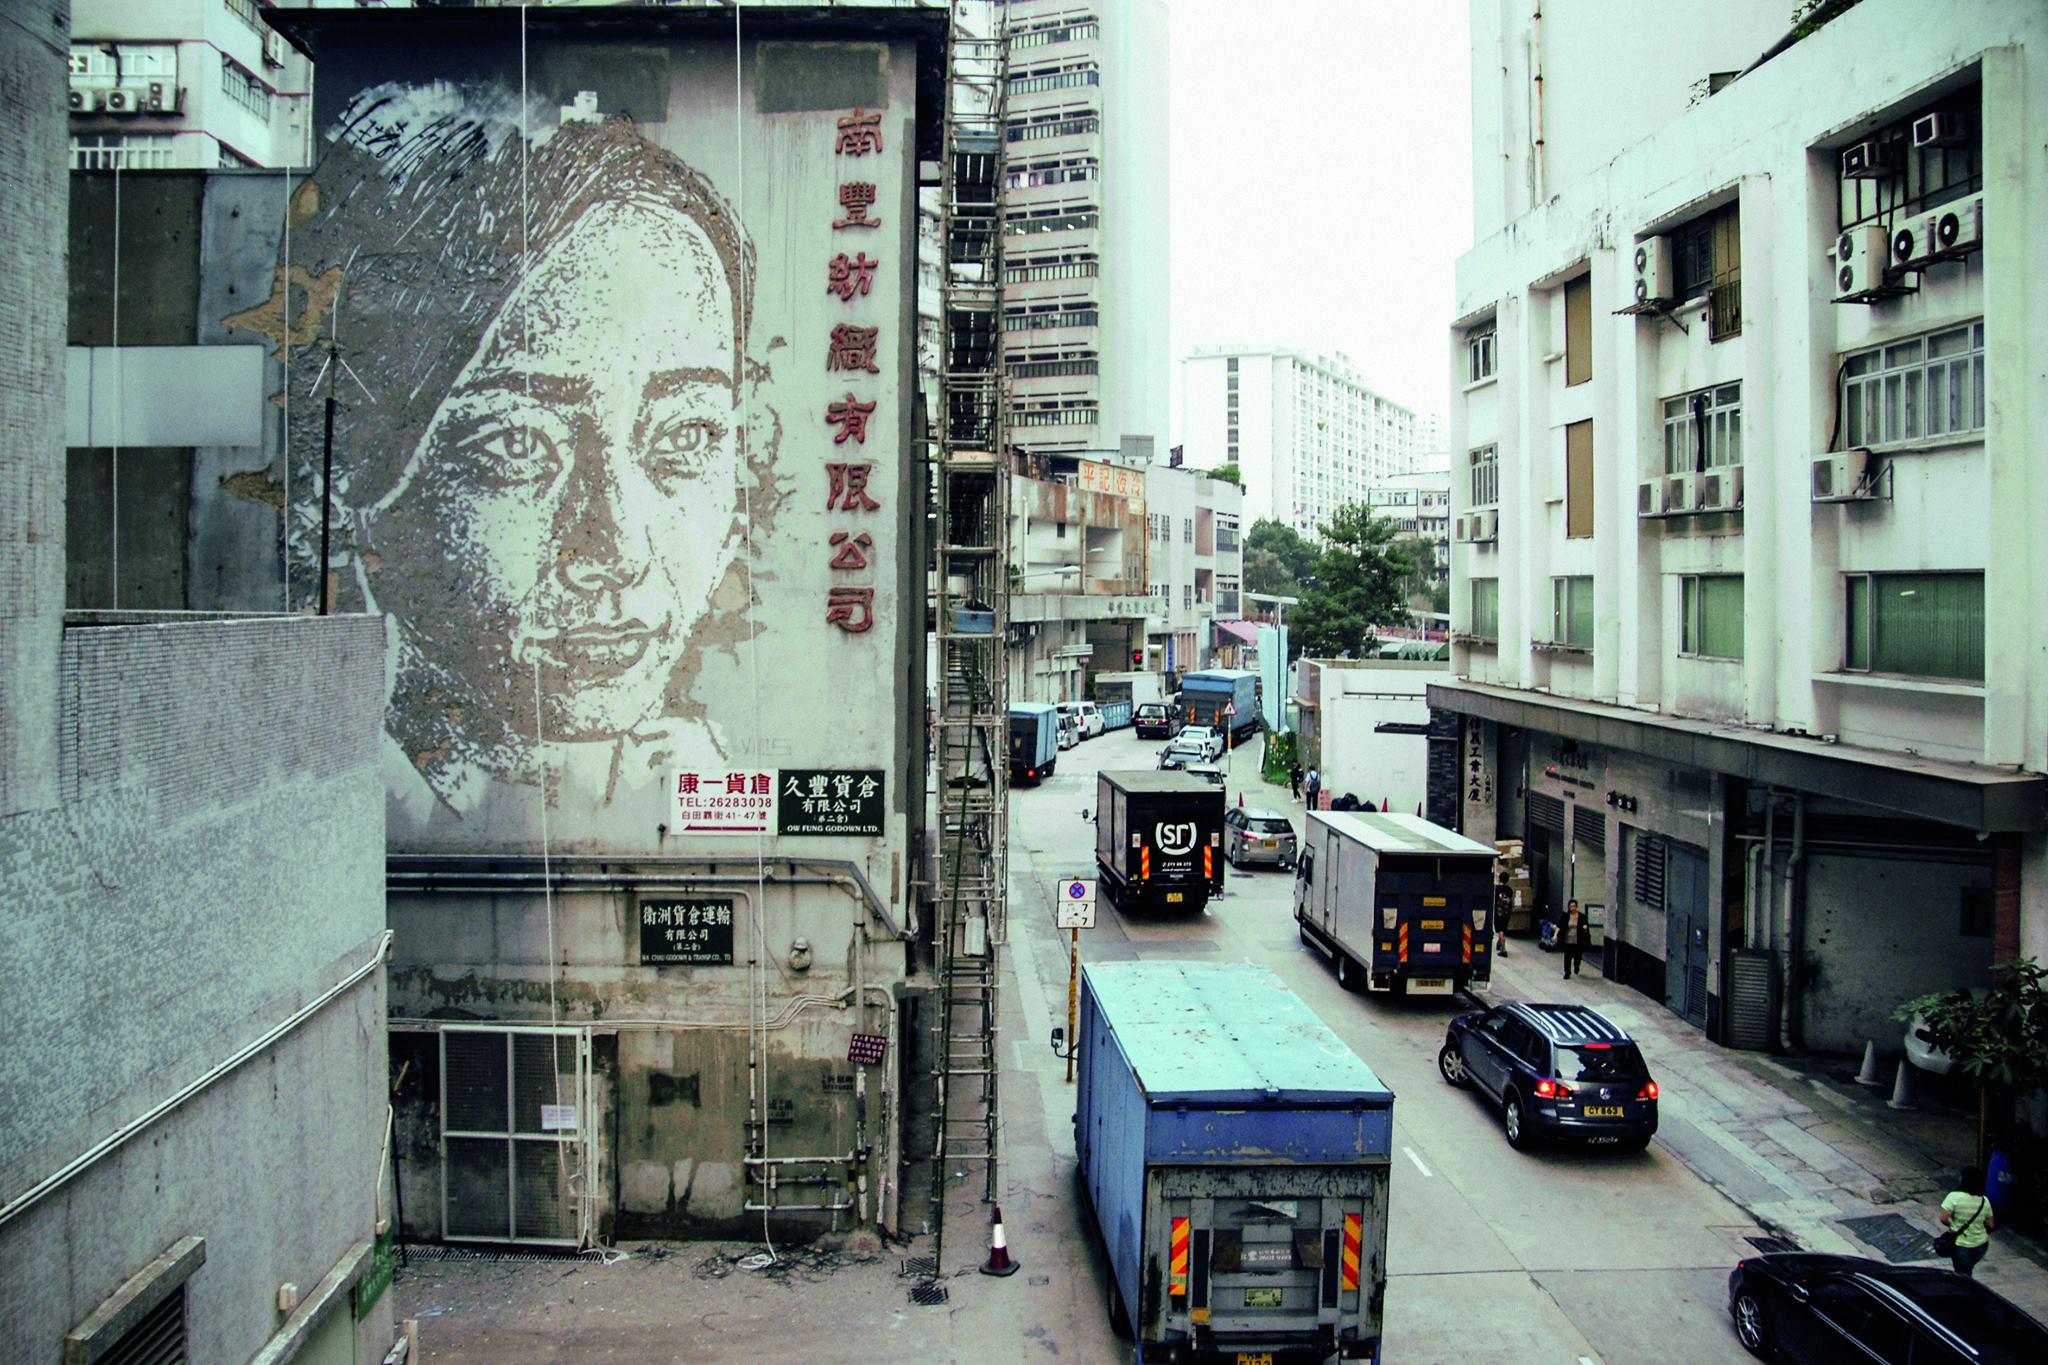 vhils graffiti escutura vandalismo dionisio arte (19)